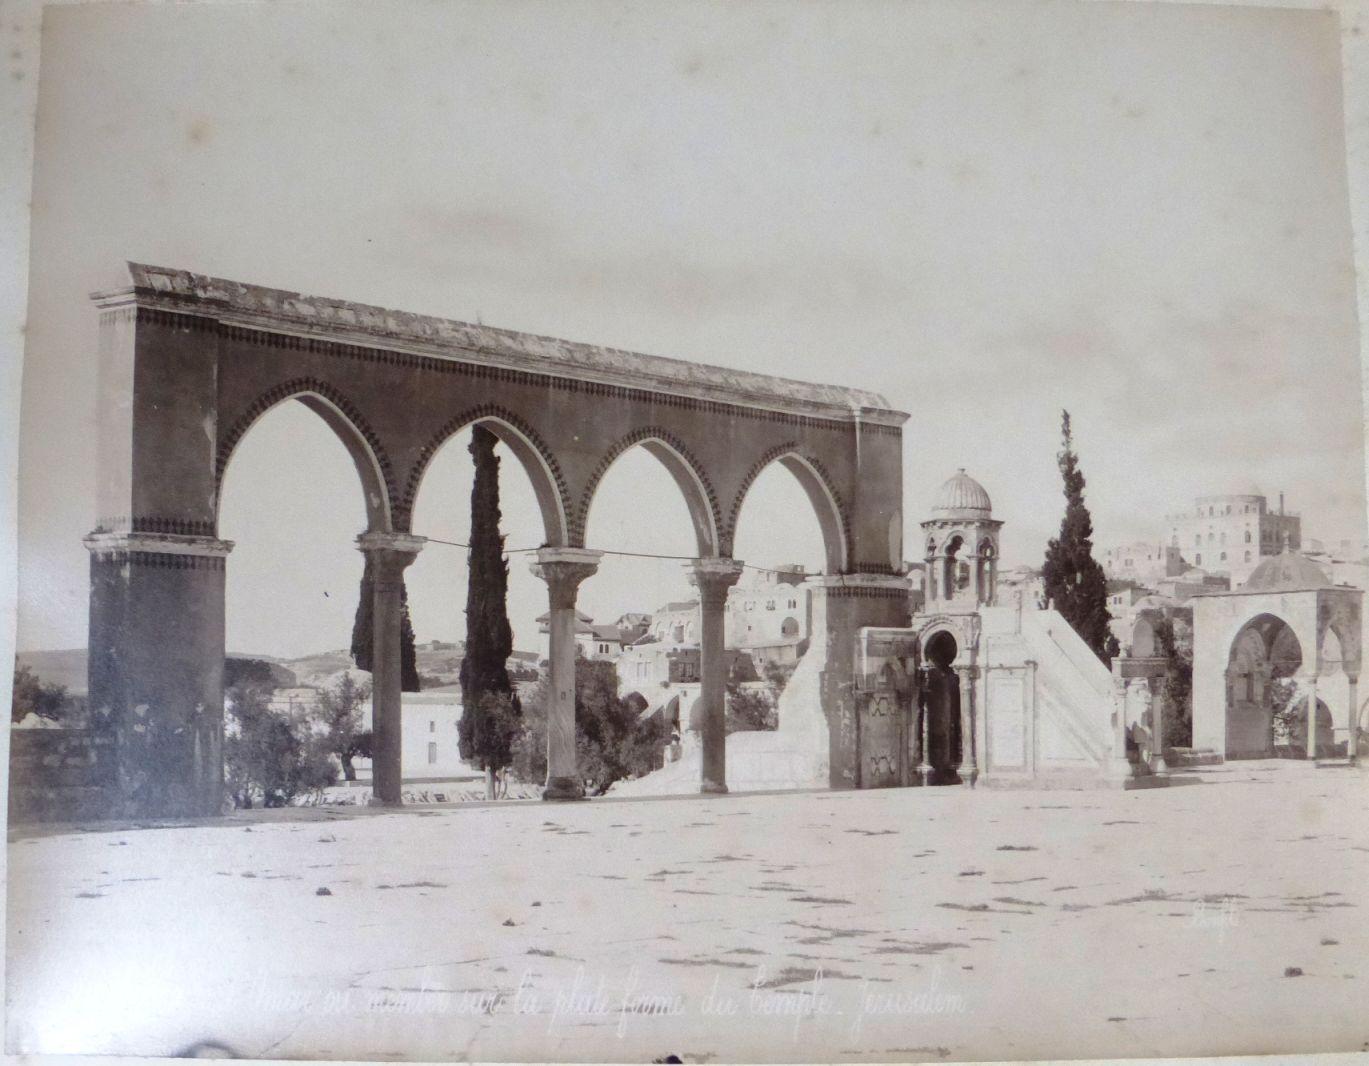 צילום קולודיון, מראה הר הבית Chaire de Omar ou memler sur la plate Fovine du Temple Jerusalem